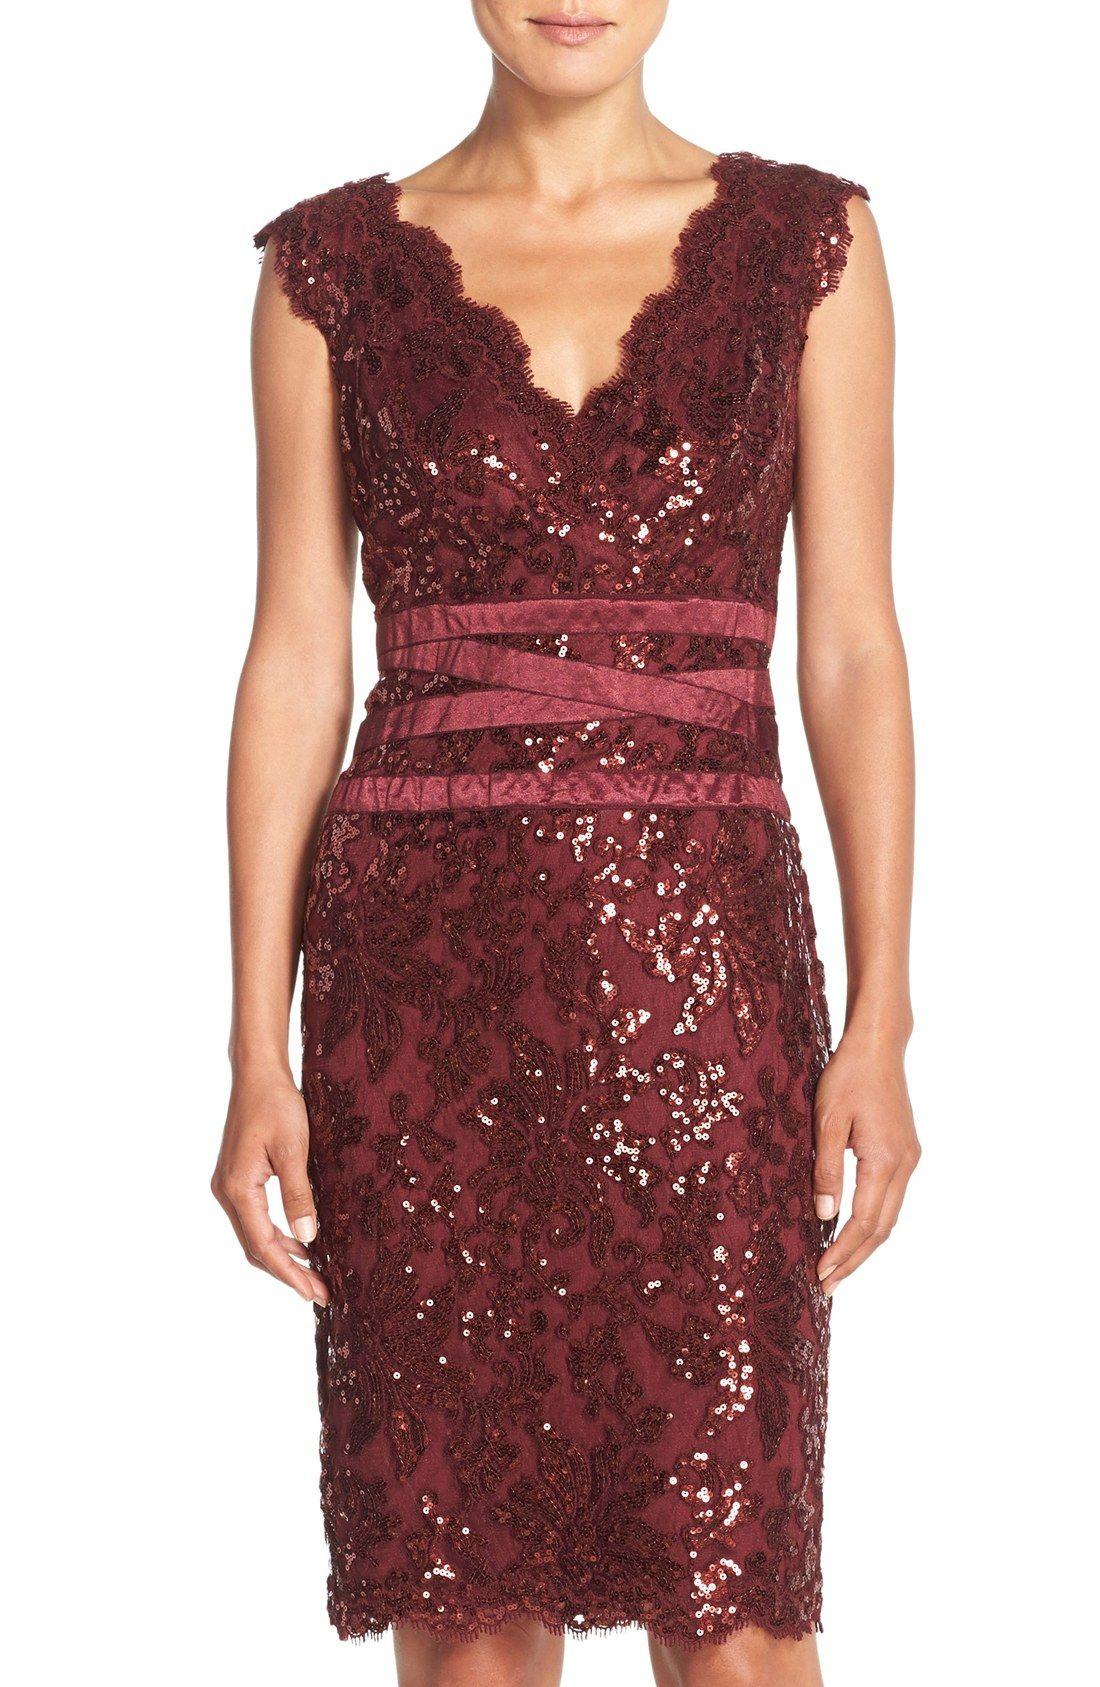 6e313f04006c8 Free shipping and returns on Tadashi Shoji Sequin Lace Sheath Dress (Regular    Petite) at Nordstrom.com. Luminous sequins and metallic threads highlight  the ...